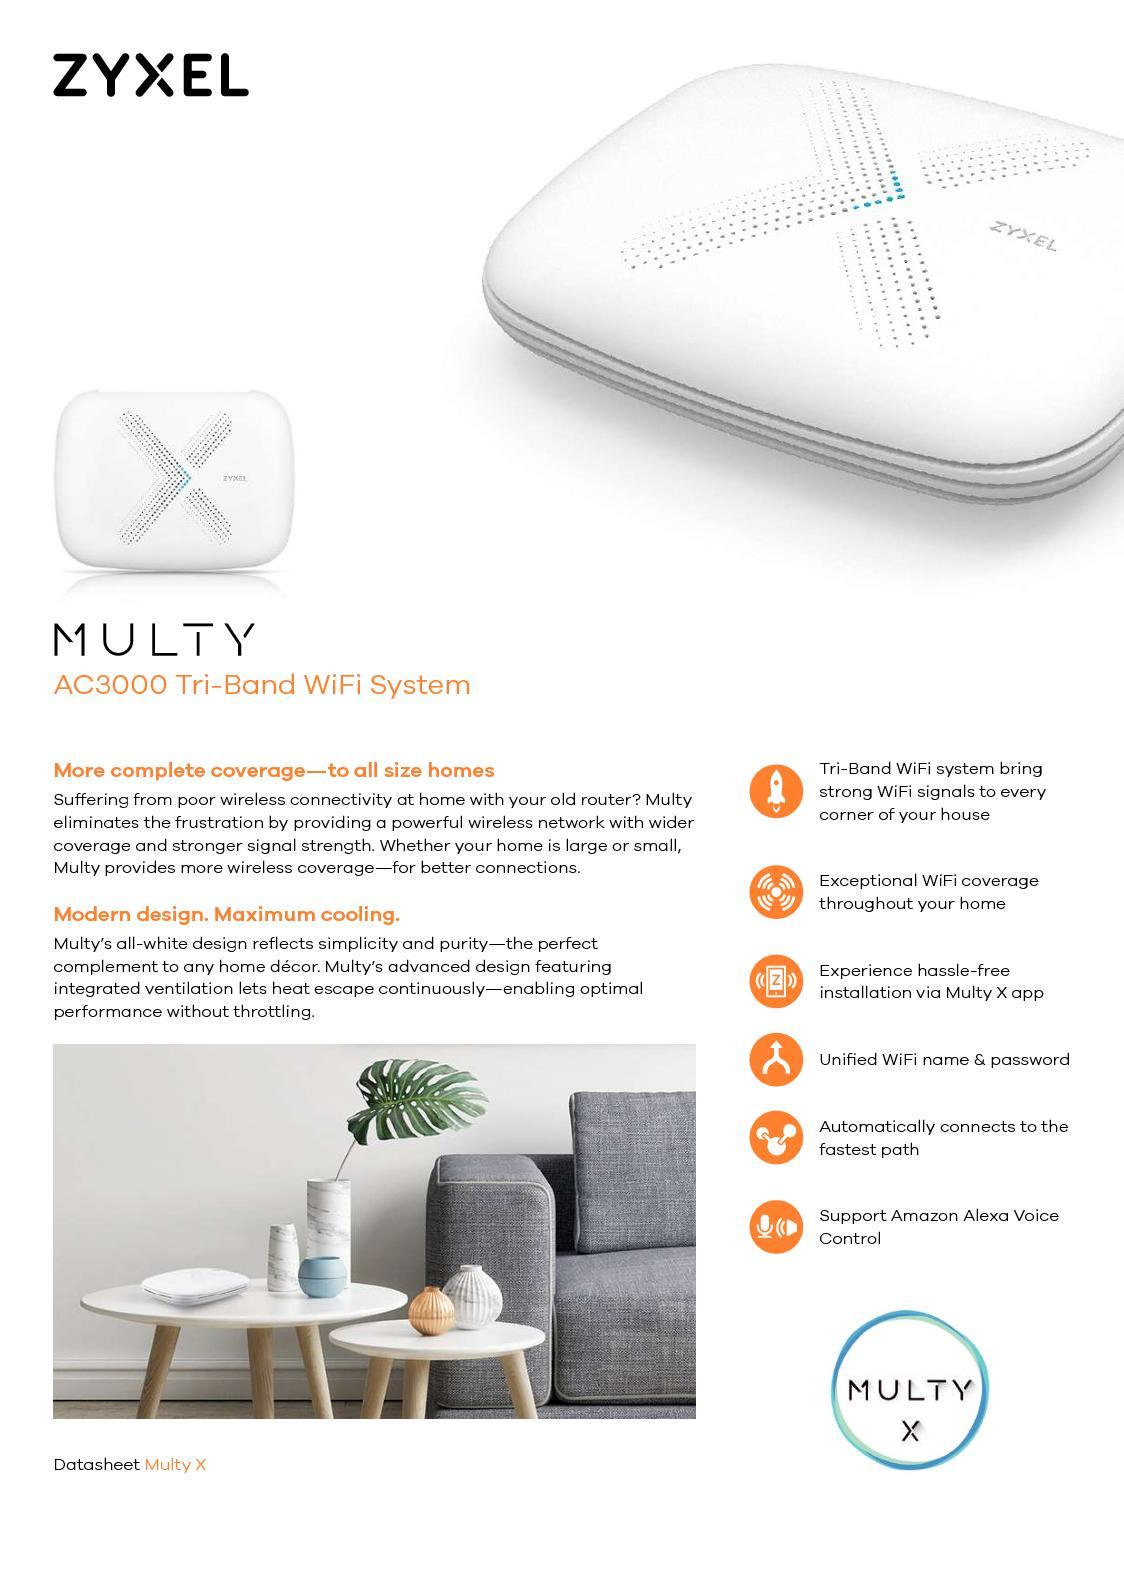 Calaméo - Multy X AC3000 Sistema WiFi Tri-Banda